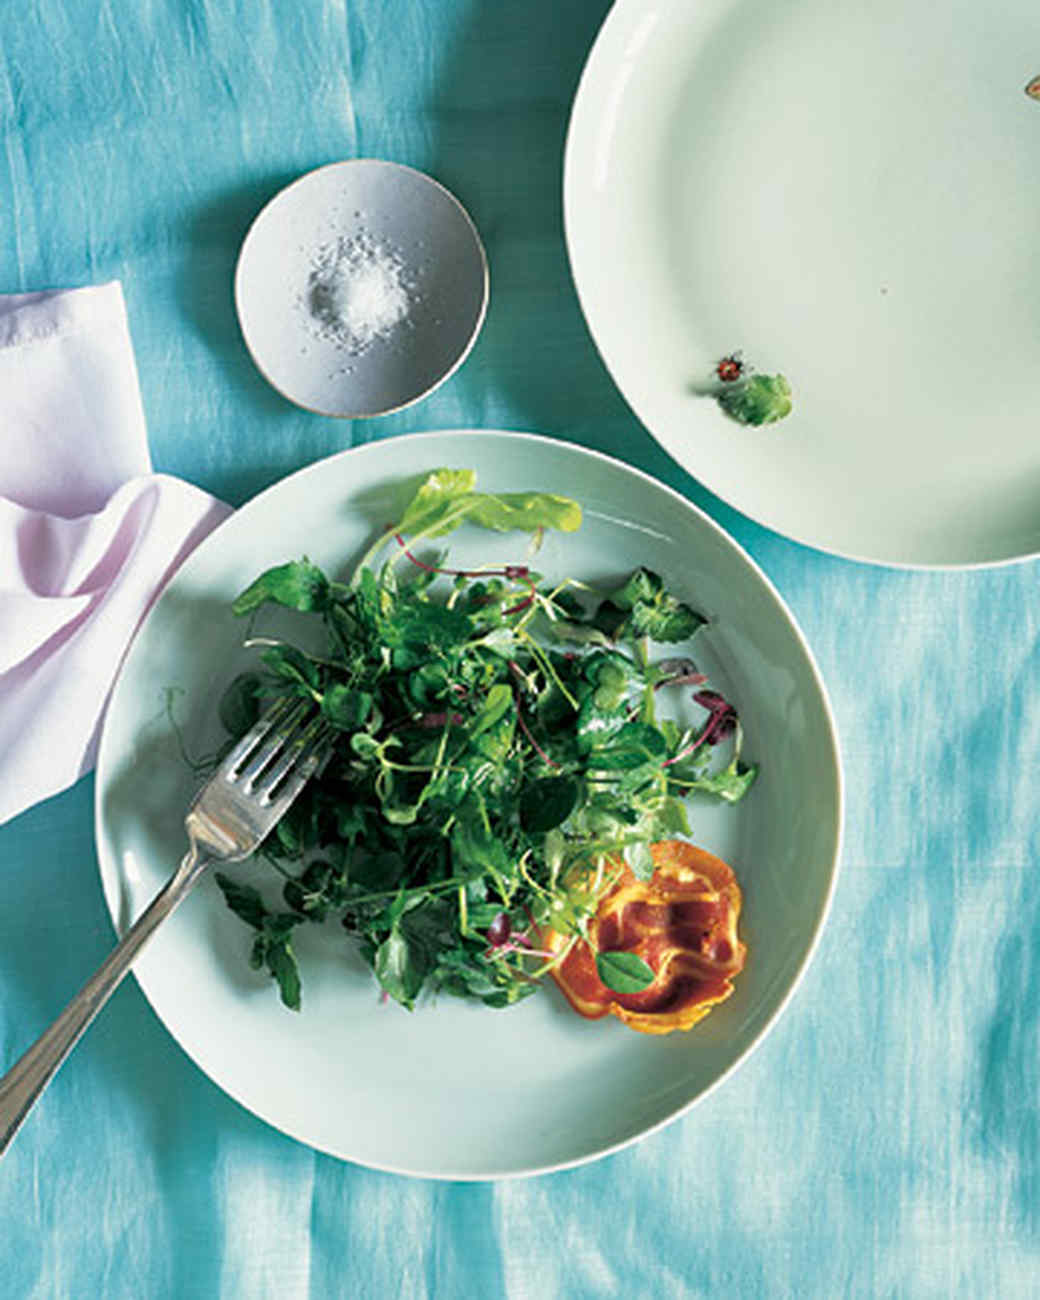 Pea Shoots, Crisped Pancetta, and Mint Vinaigrette